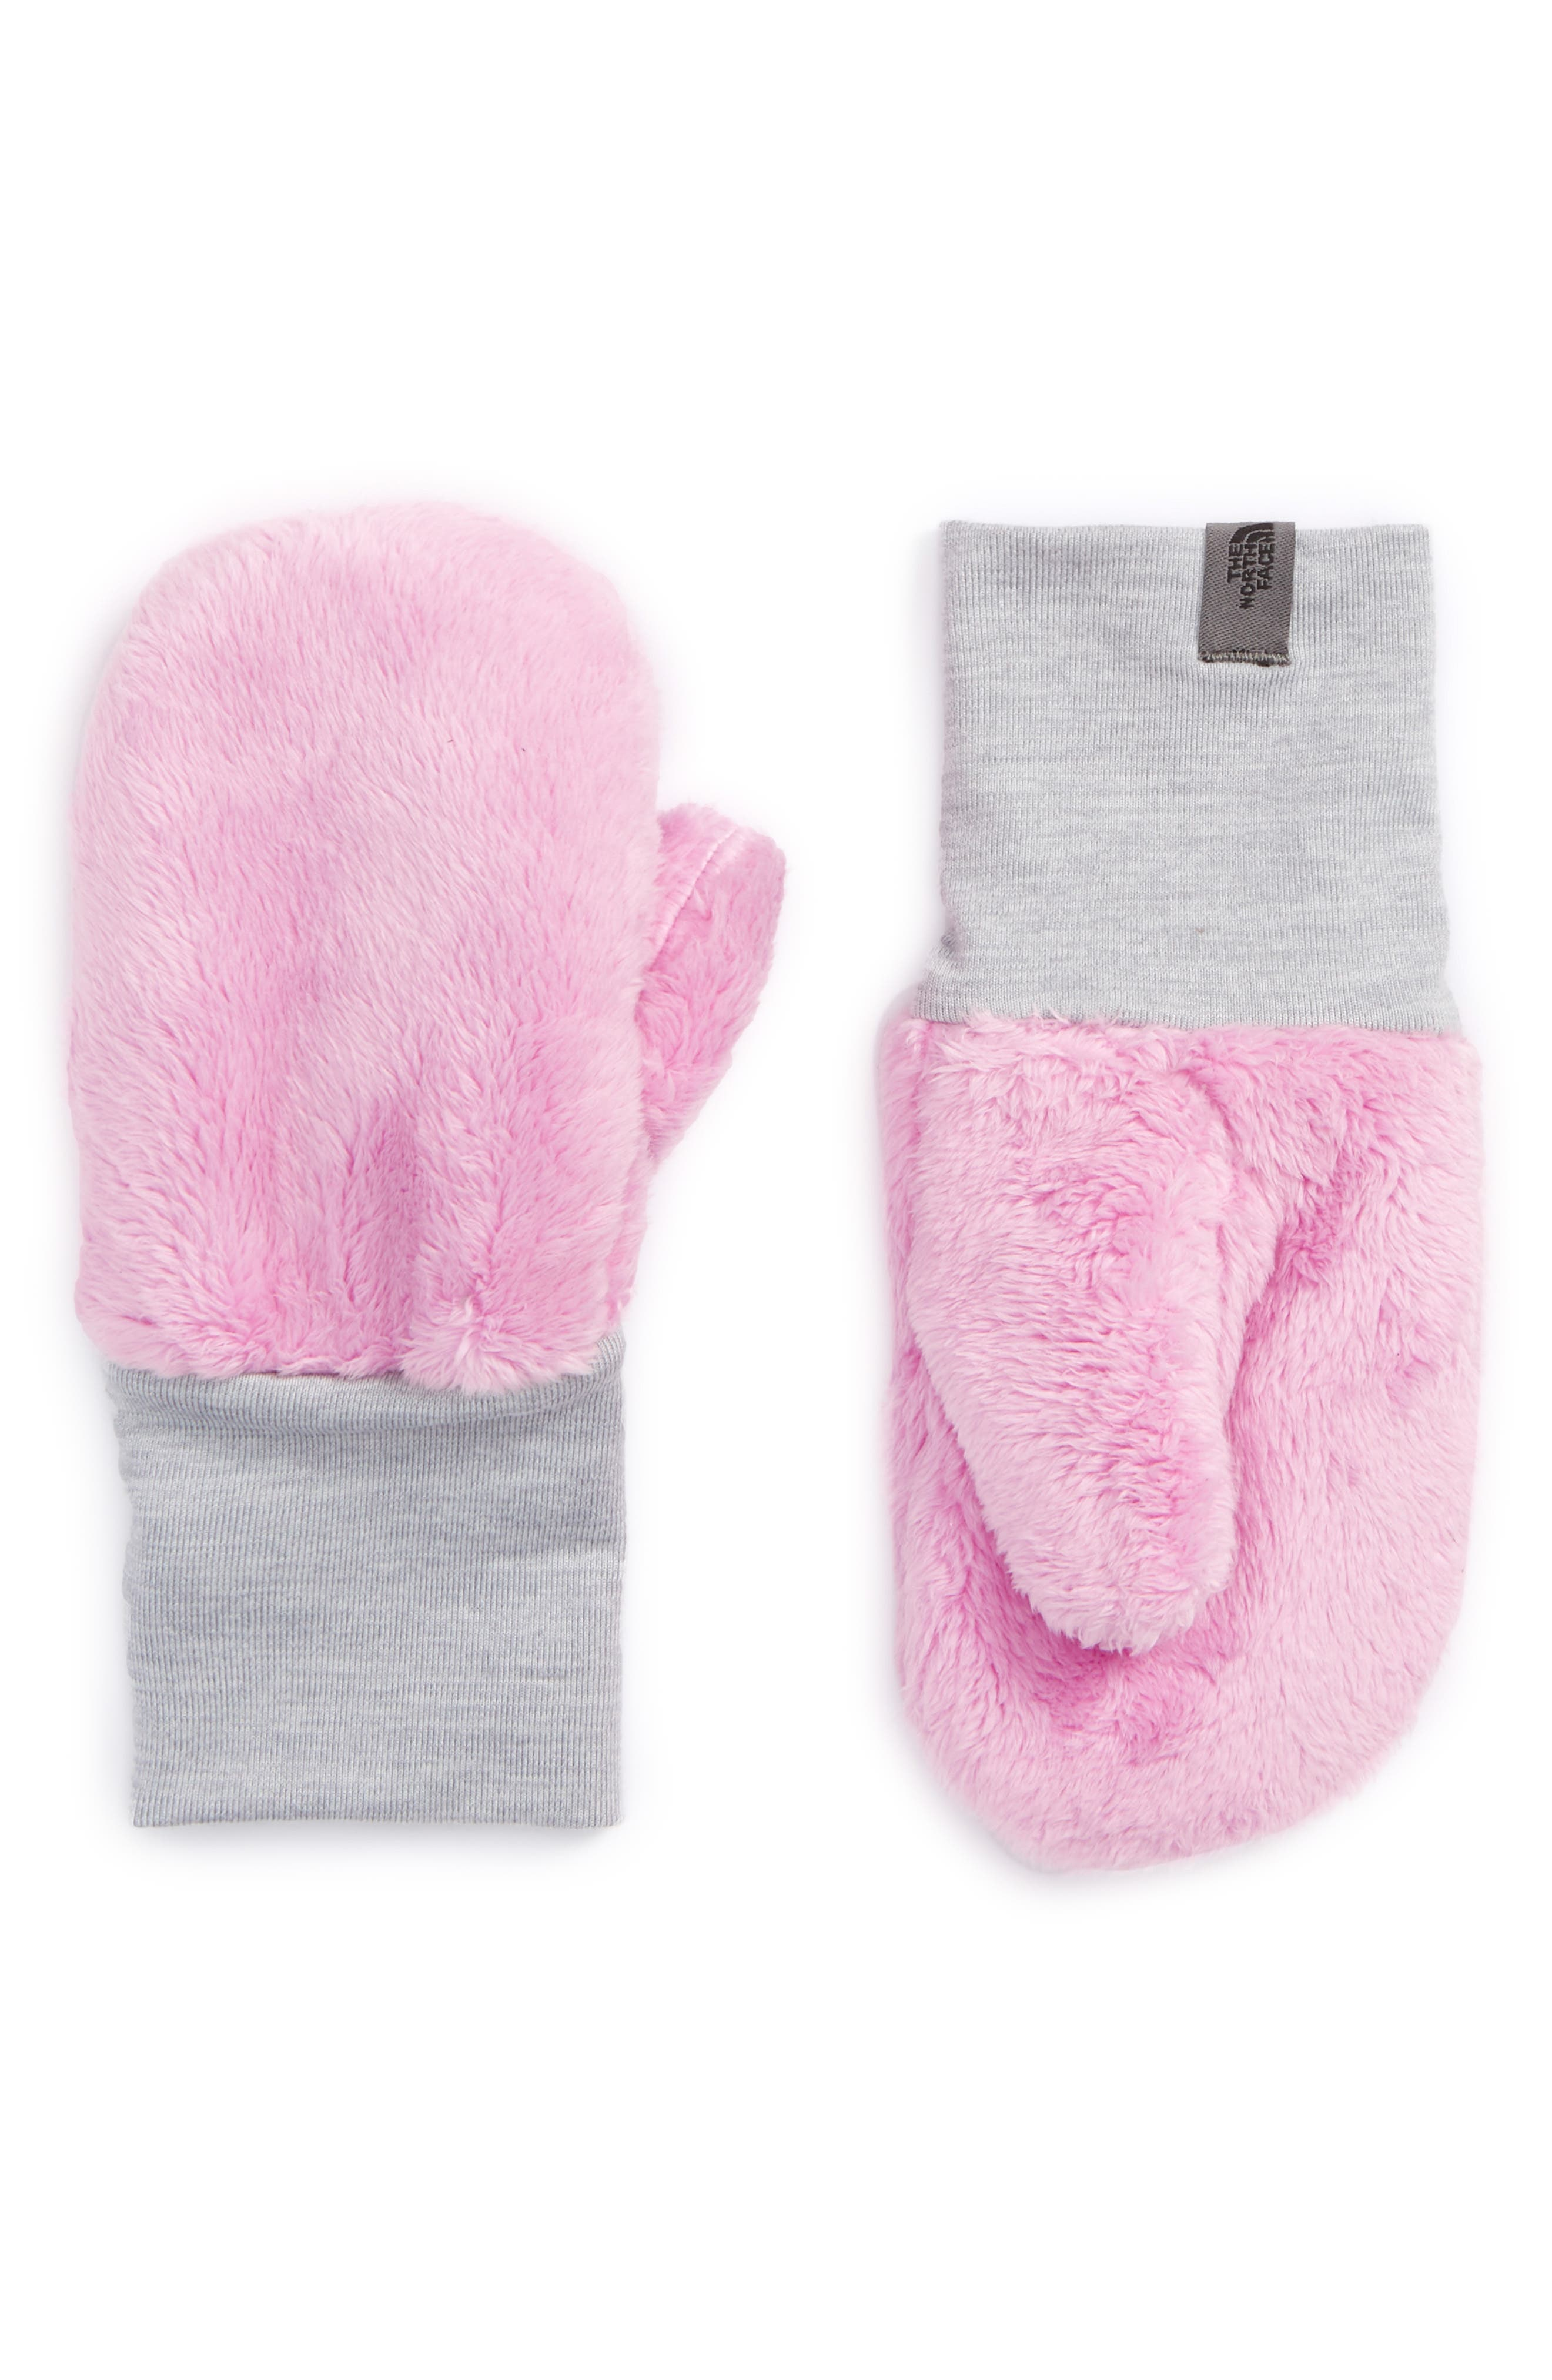 Main Image - The North Face Osilito High Loft Fleece Mittens (Toddler Girls)